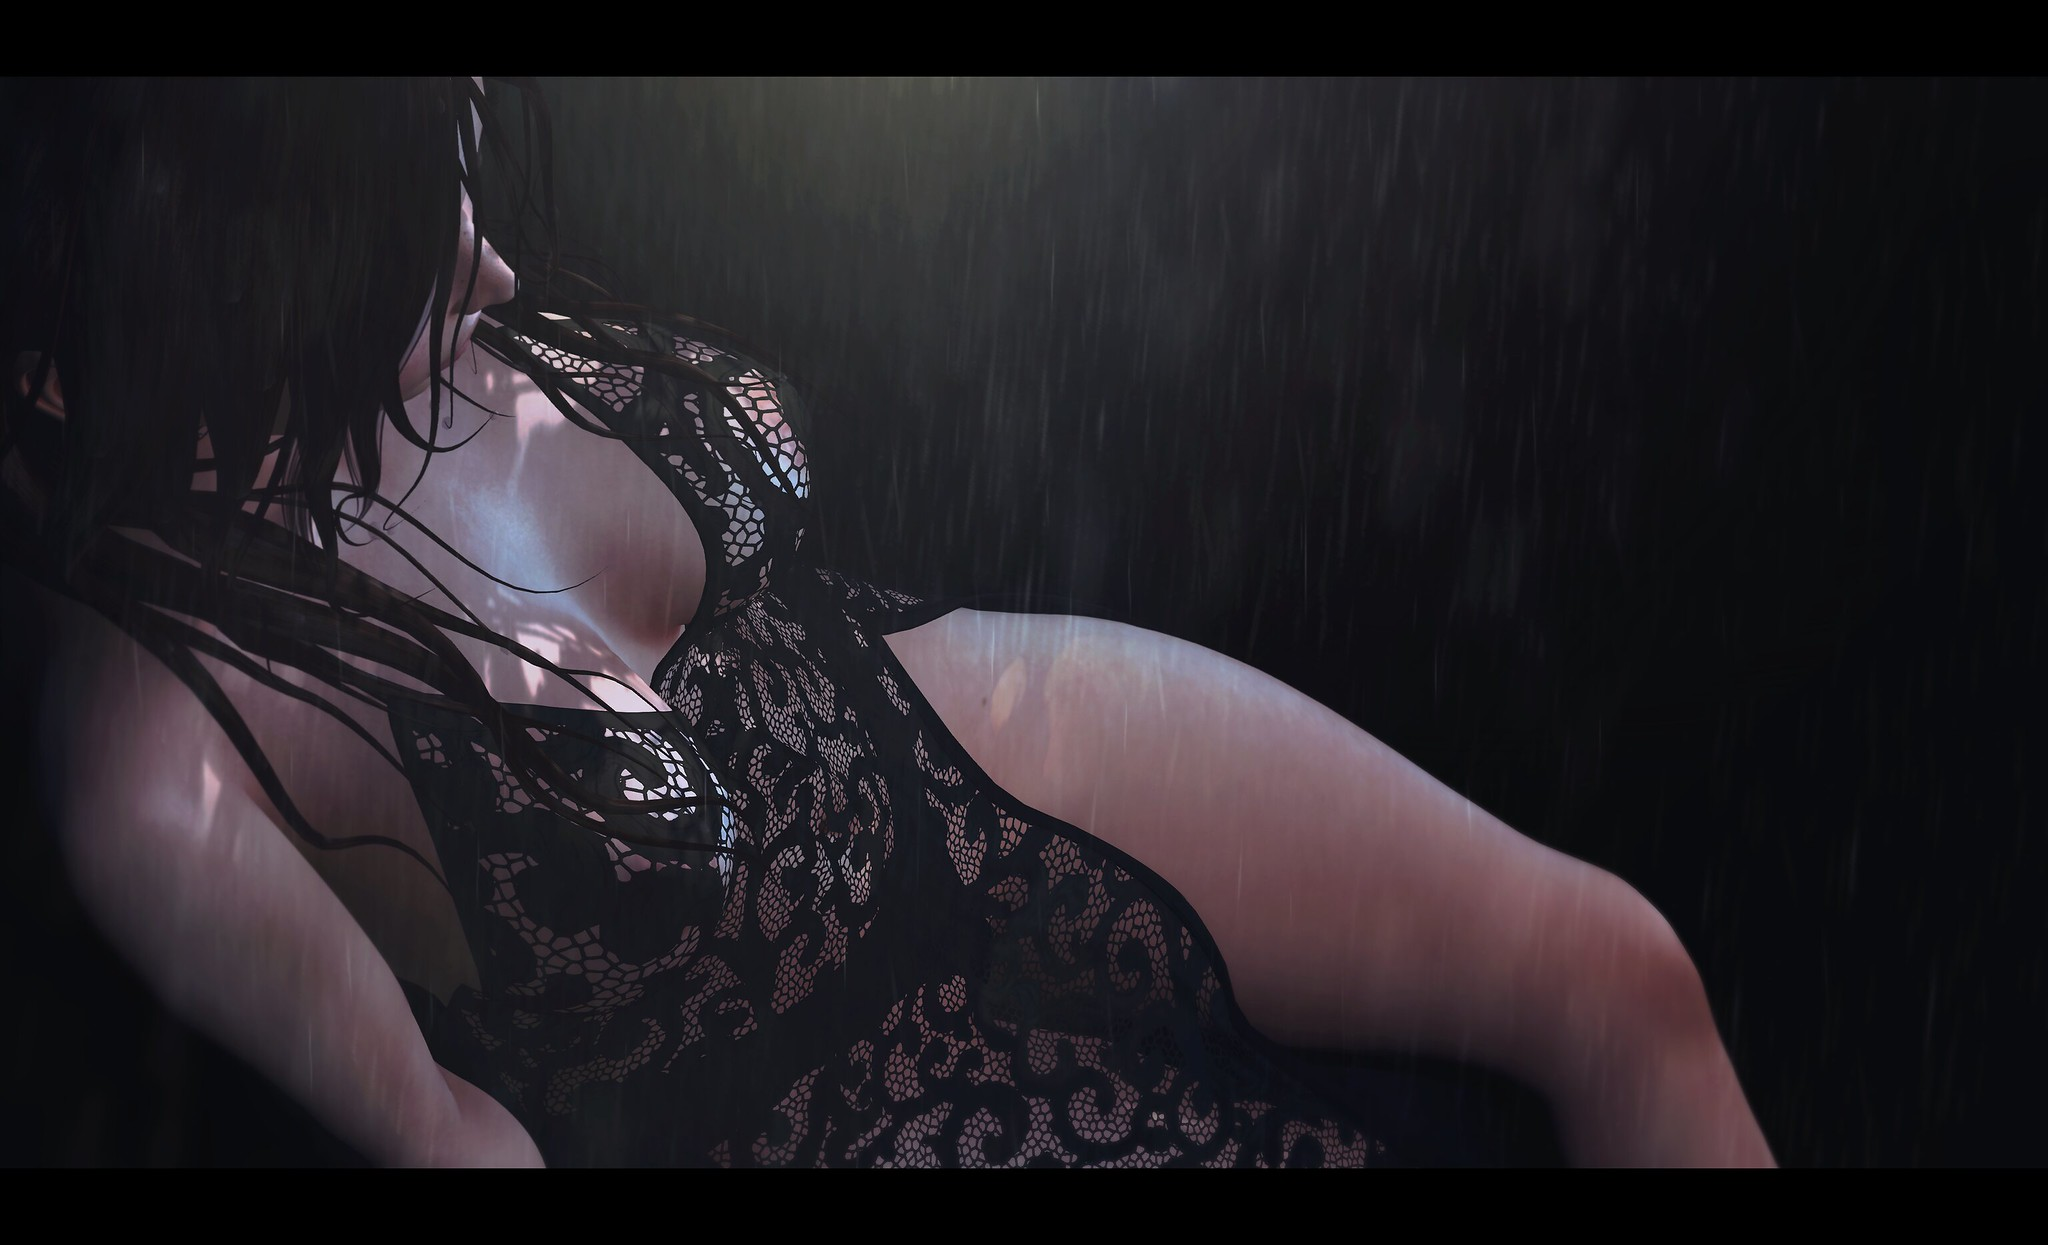 Bring on the rain.